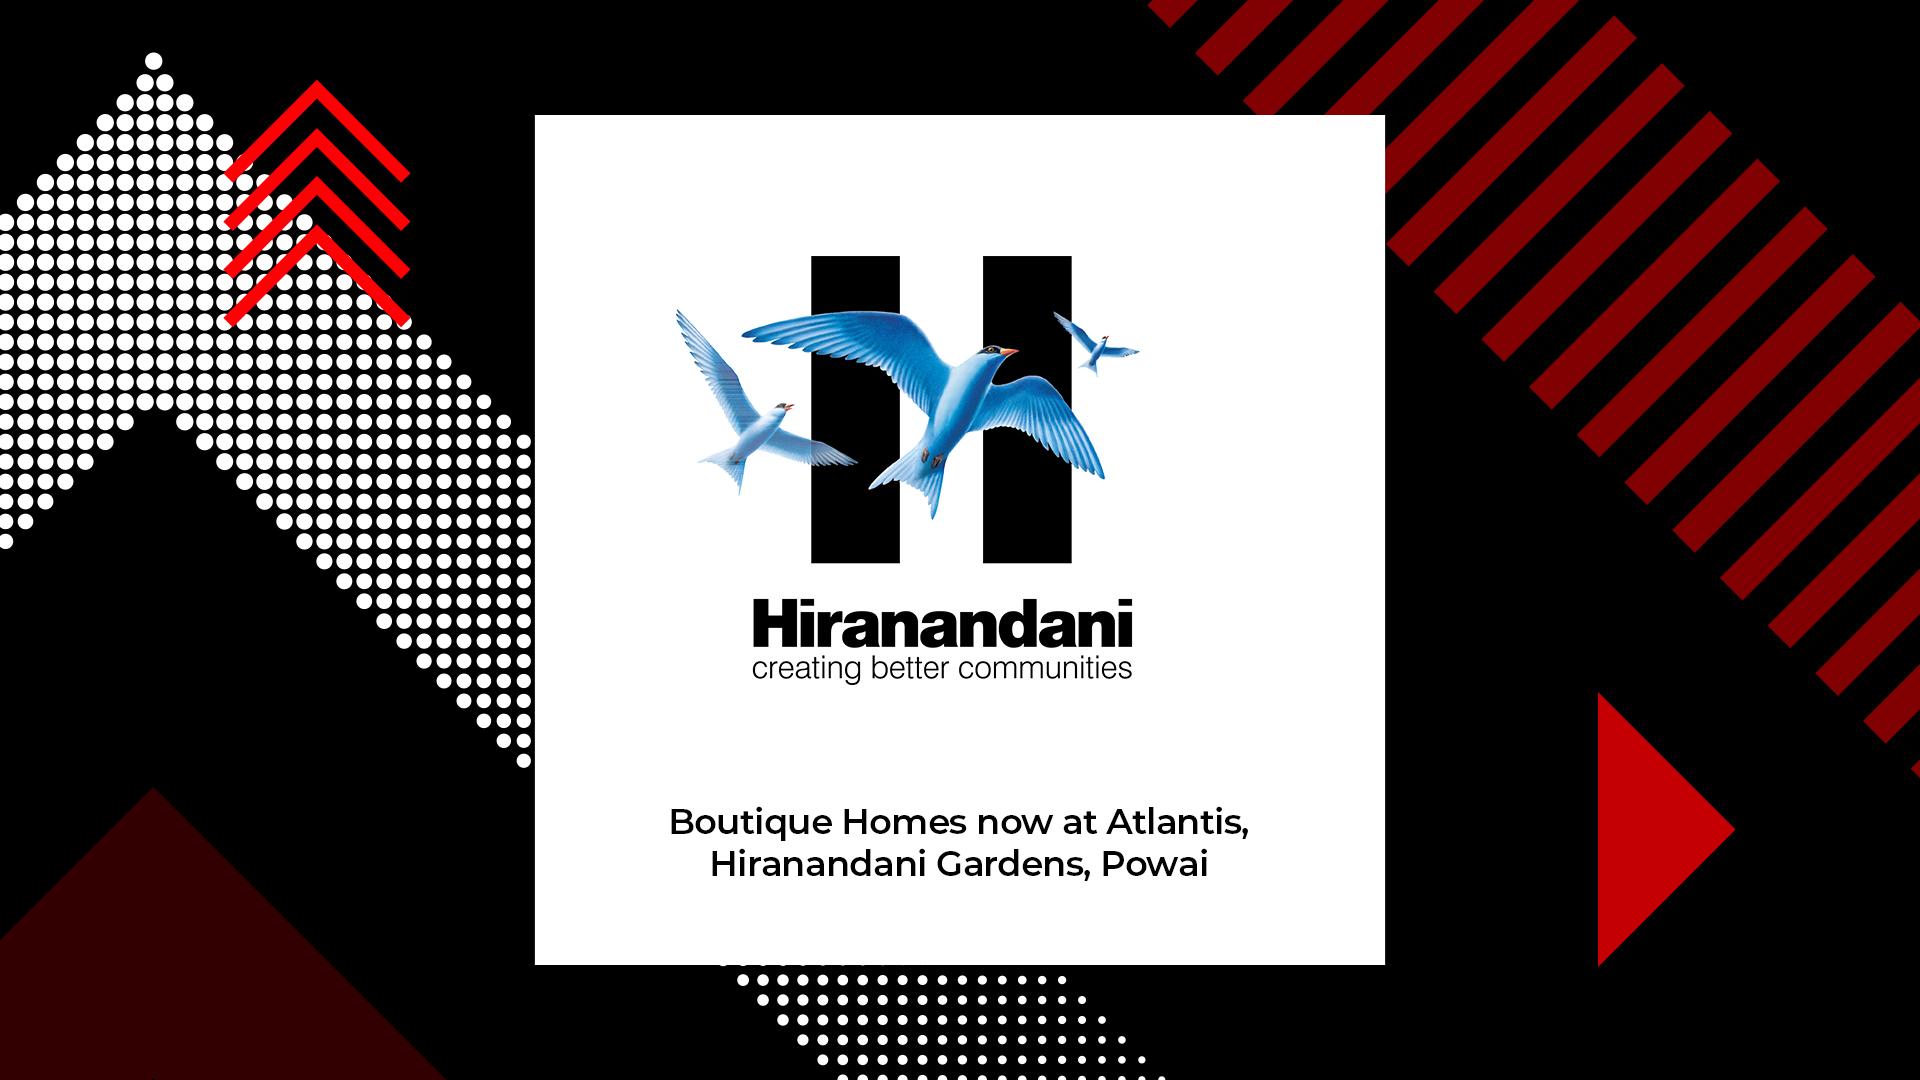 Hiranandani Gardens Offers Boutique Homes in Atlantis at Powai